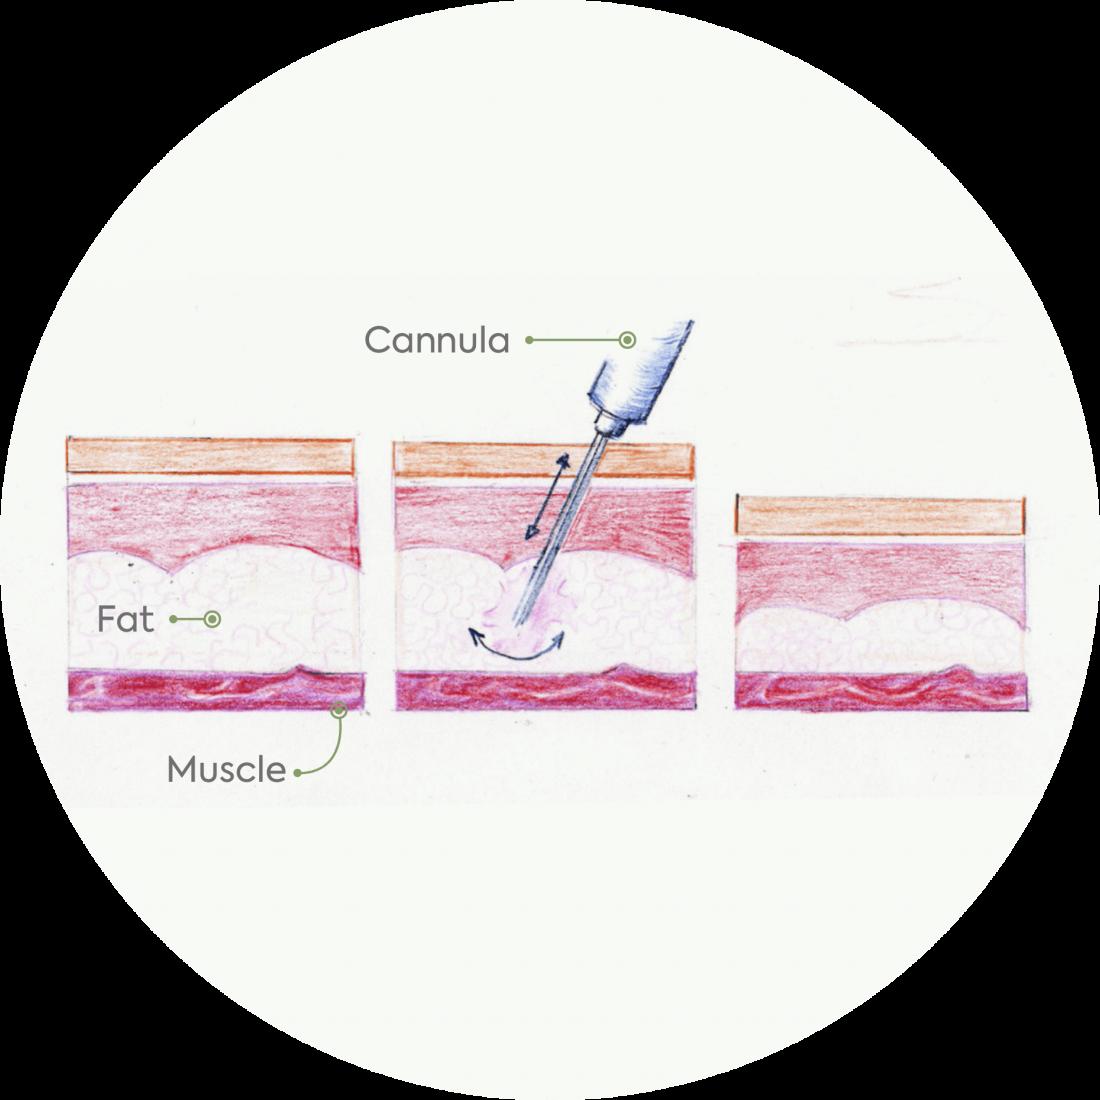 Dettagli Procedurali: Liposuzione Hi-Def